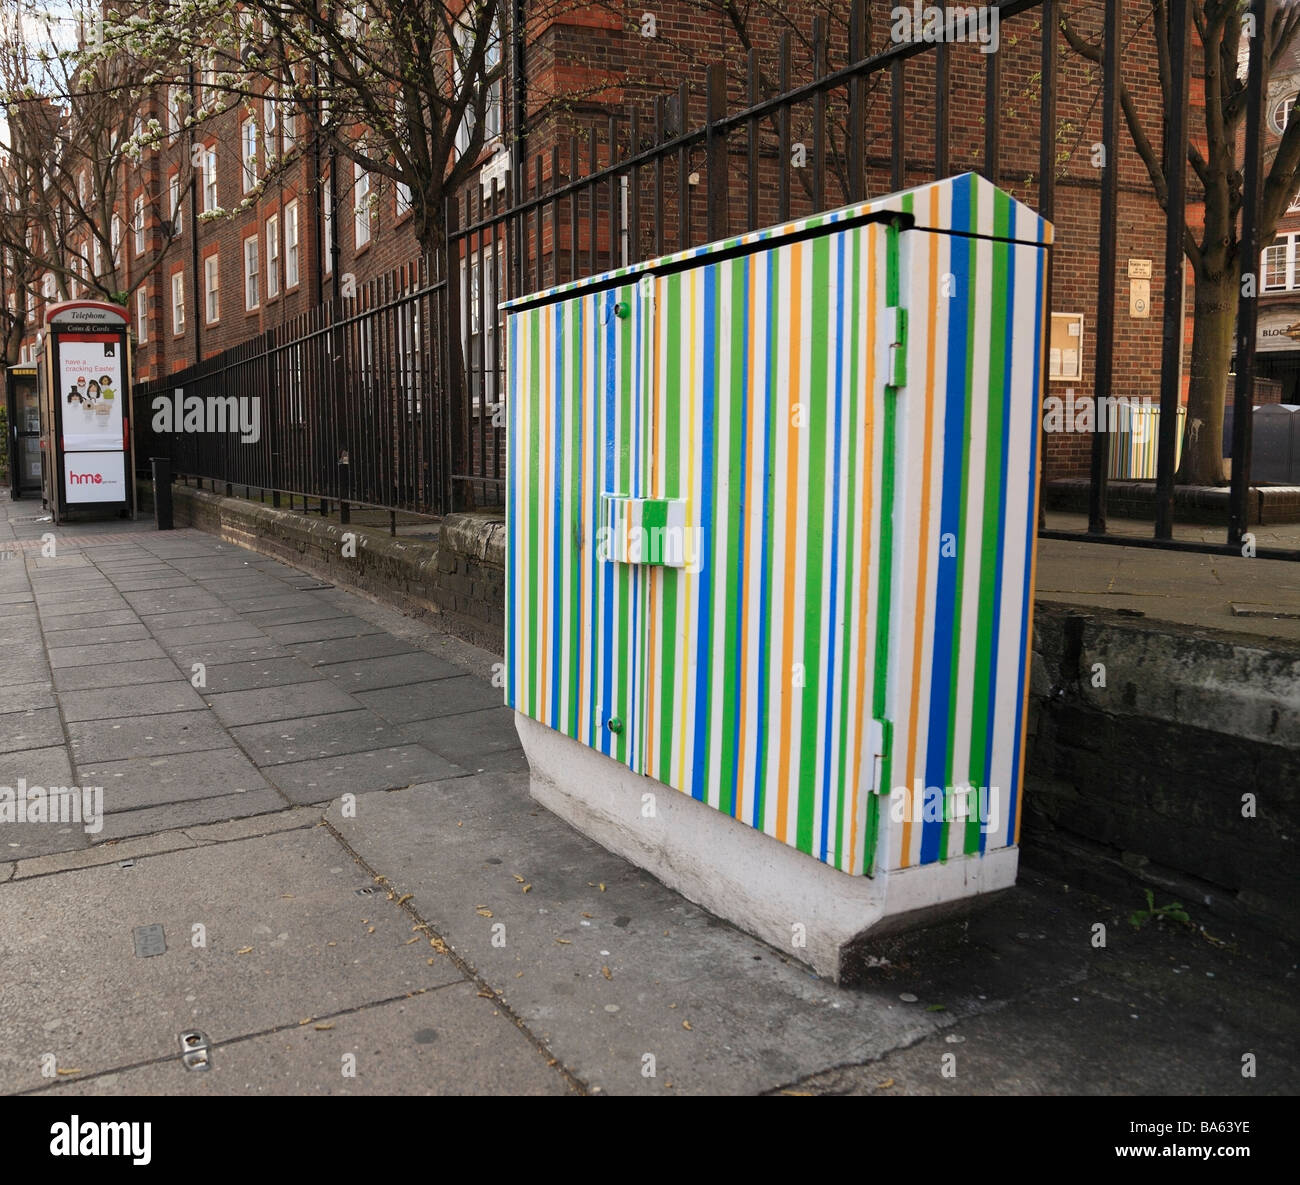 Brightly Painted street furniture. Hammersmith West London, England, UK. - Stock Image